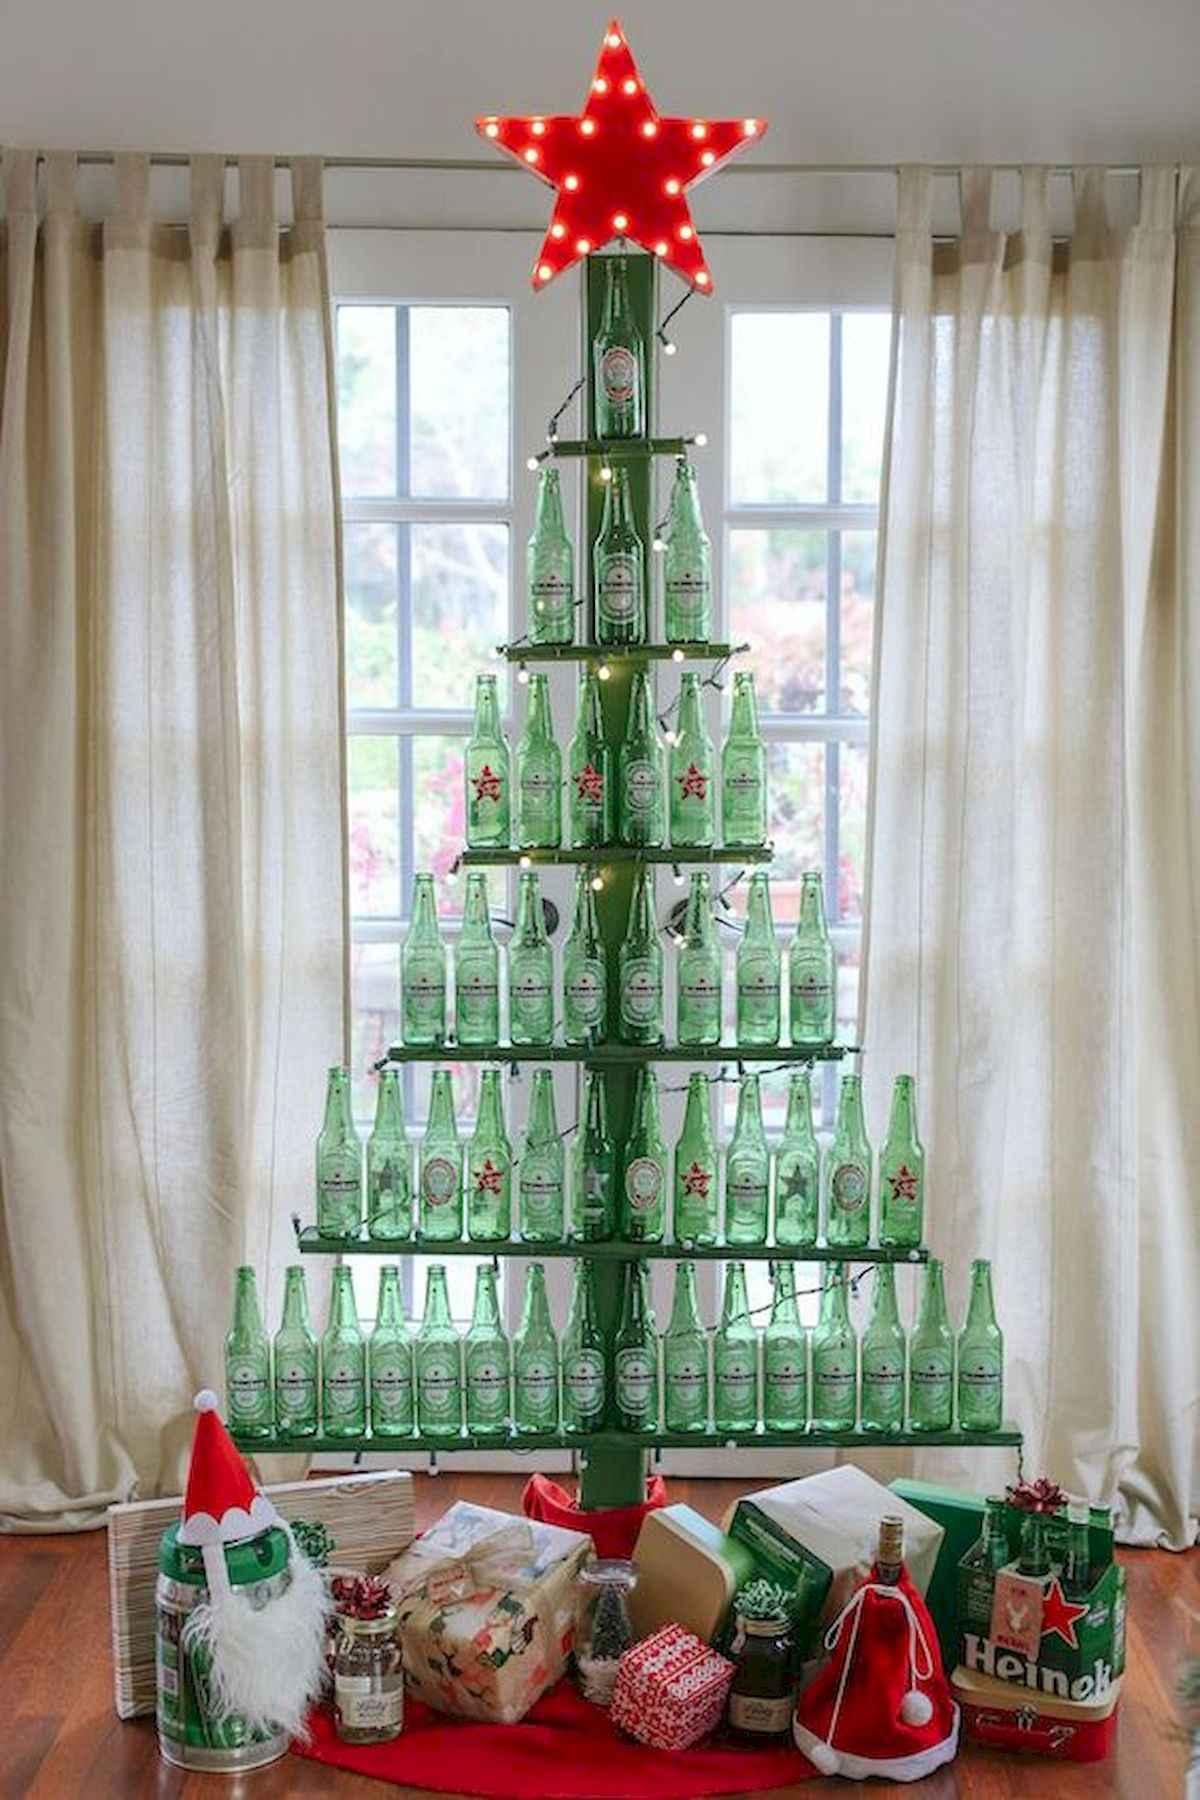 40 unique christmas tree ideas decorations (37)